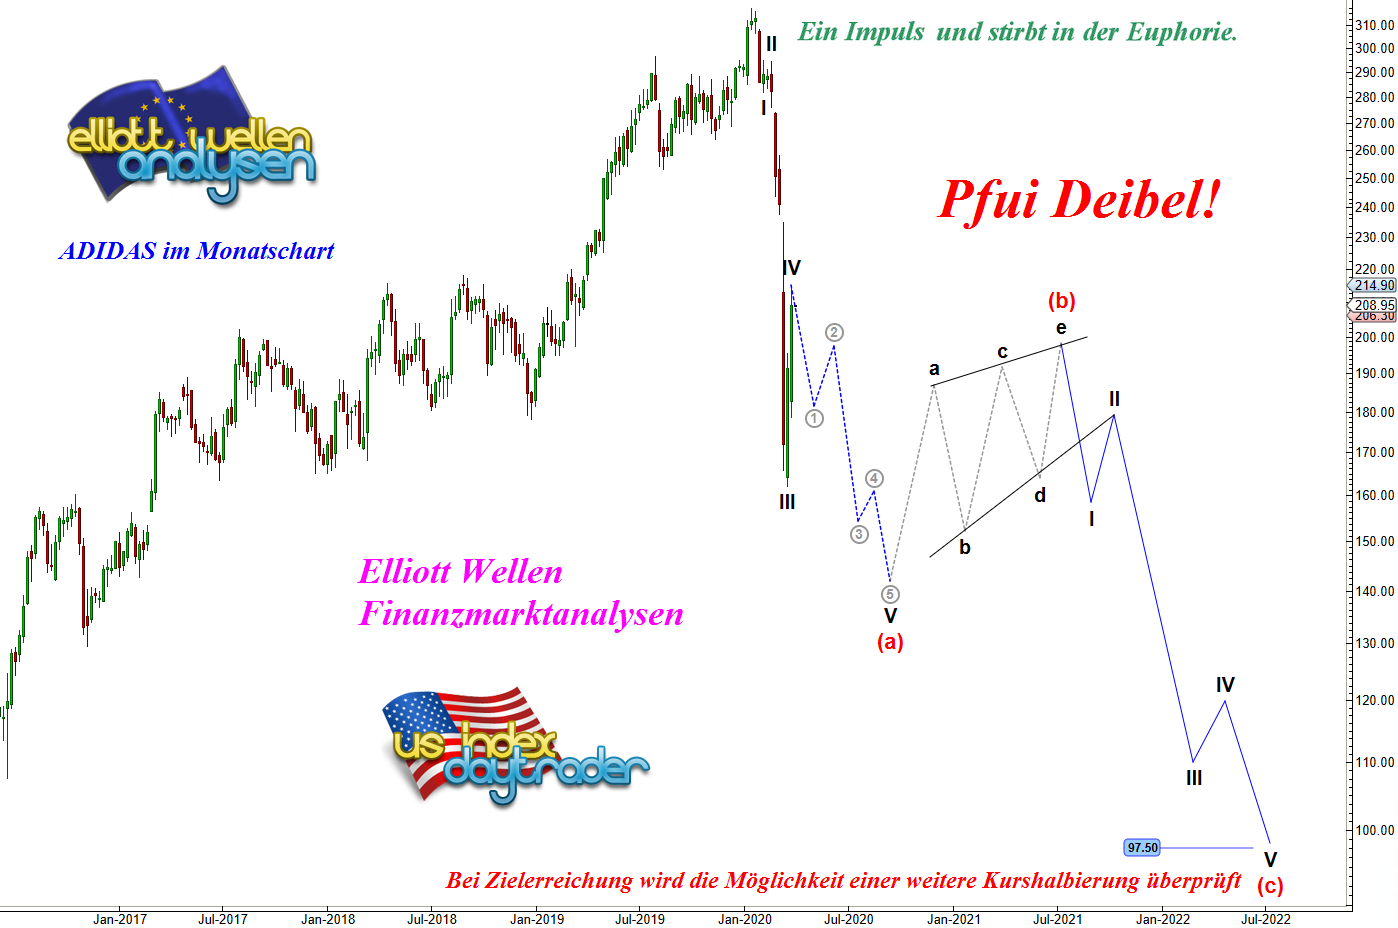 DAX-Aktien-ADIDAS-Der-Pfui-Deibel-Count-Chartanalyse-André-Tiedje-GodmodeTrader.de-1